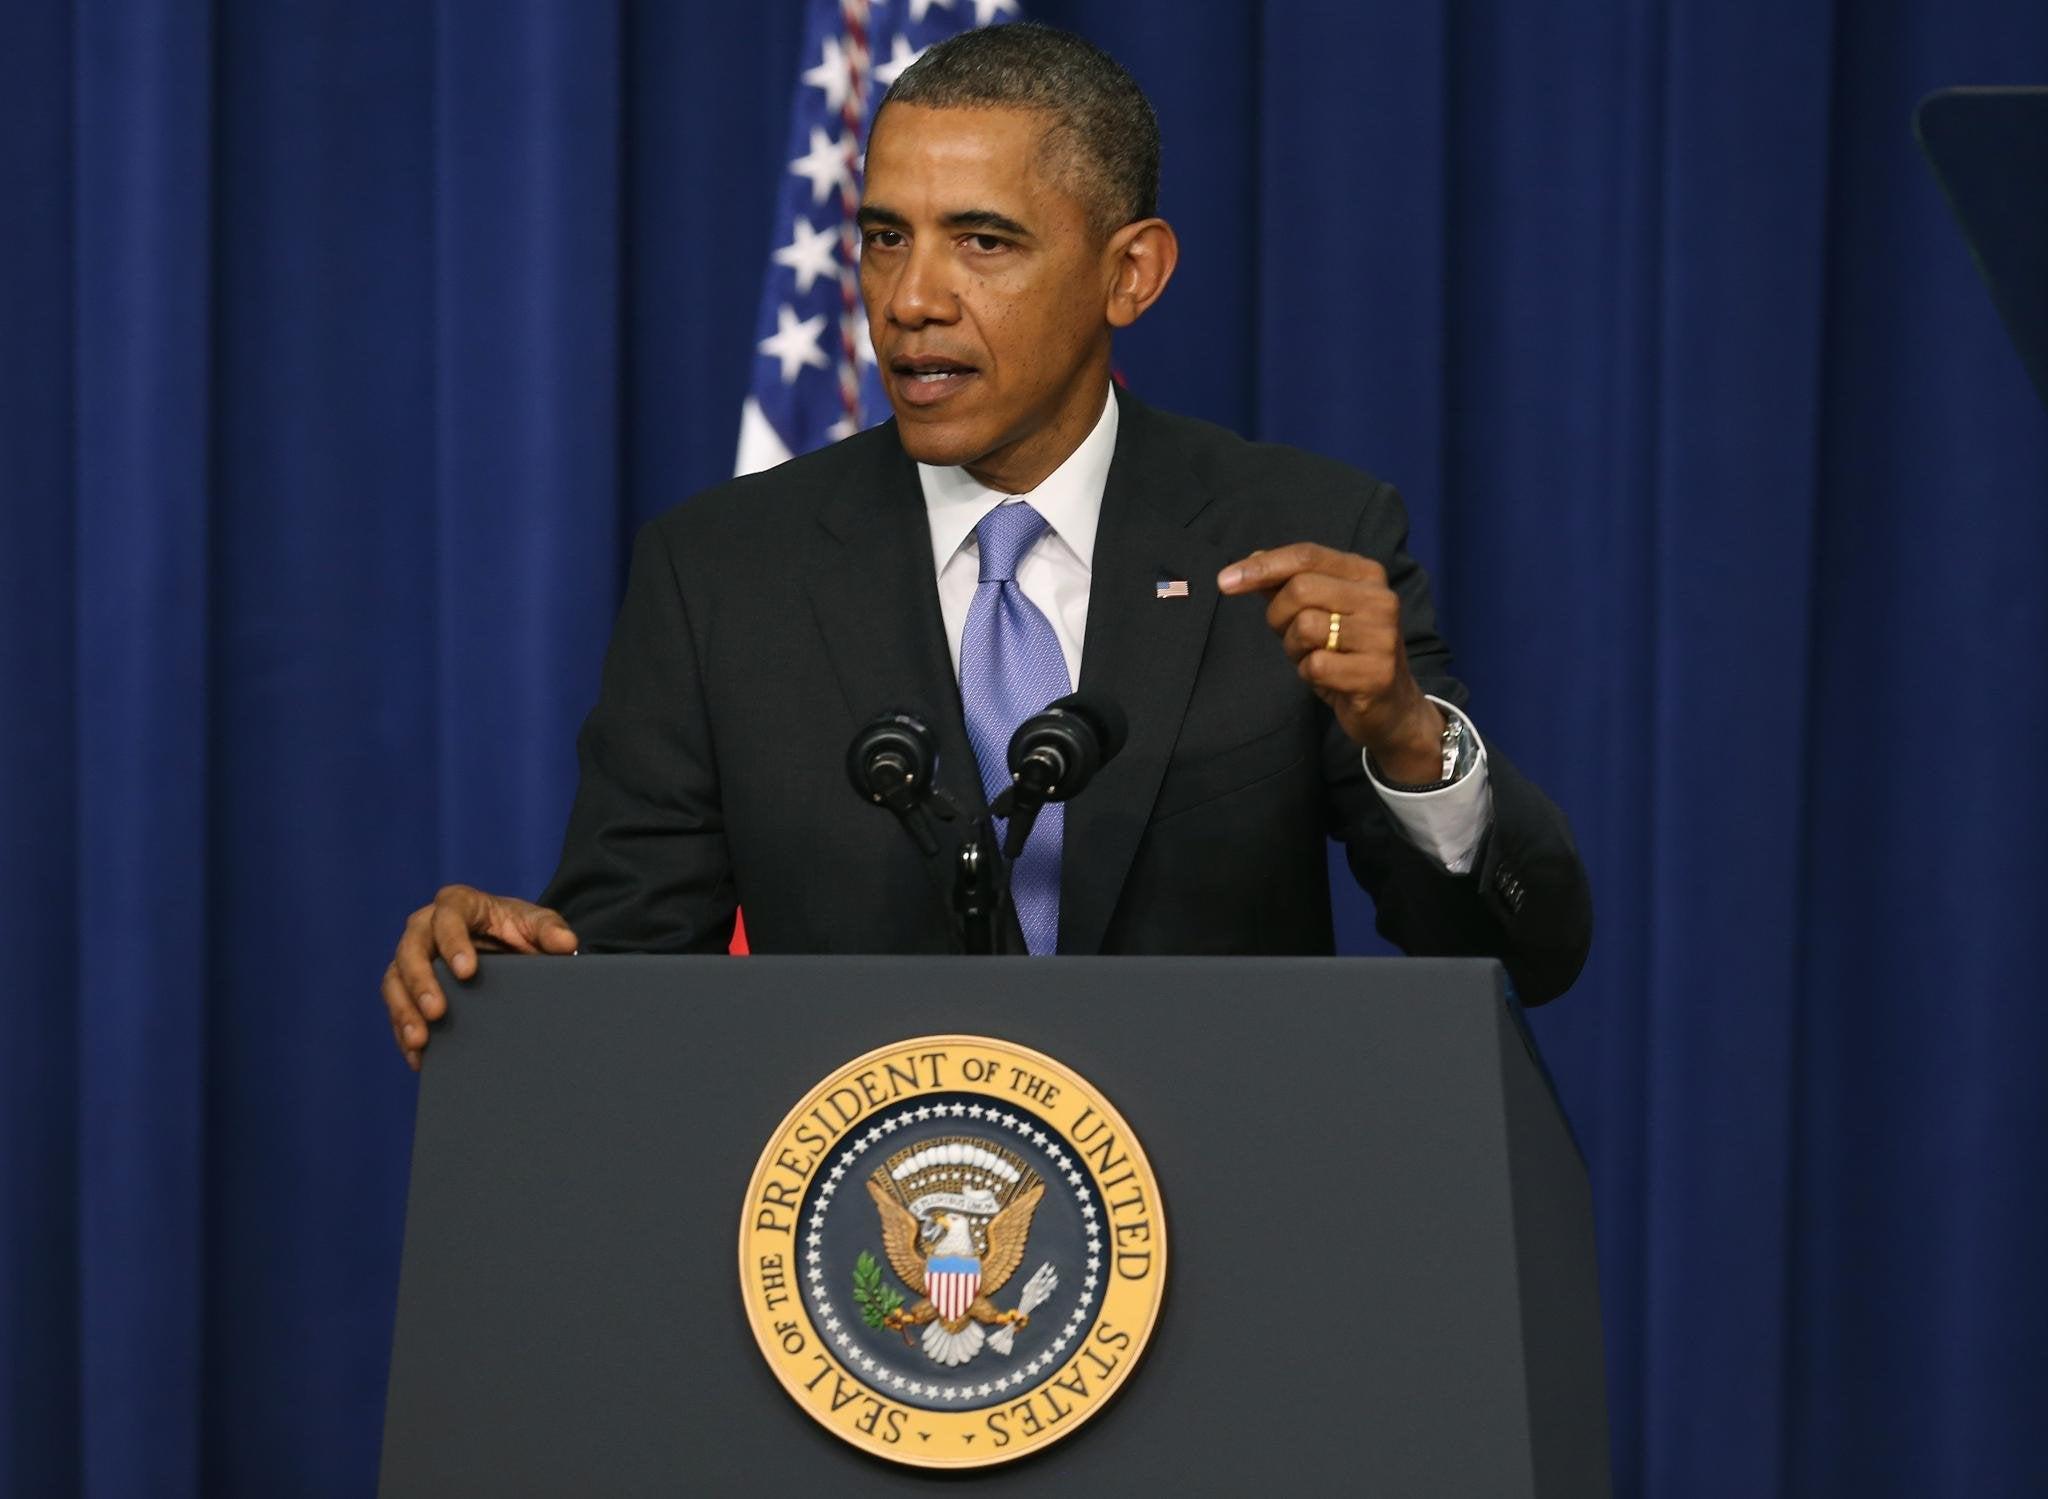 President Obama Nominates First Black Lesbian Judge